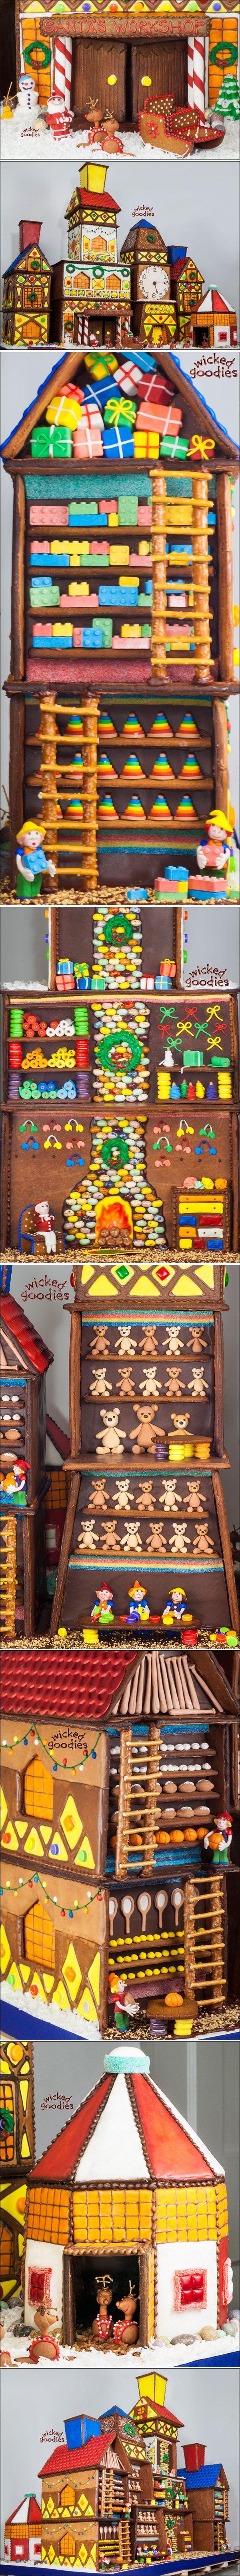 Award-Winning Gingerbread House Interpretation of Santa's Workshop by Wicked Goodies